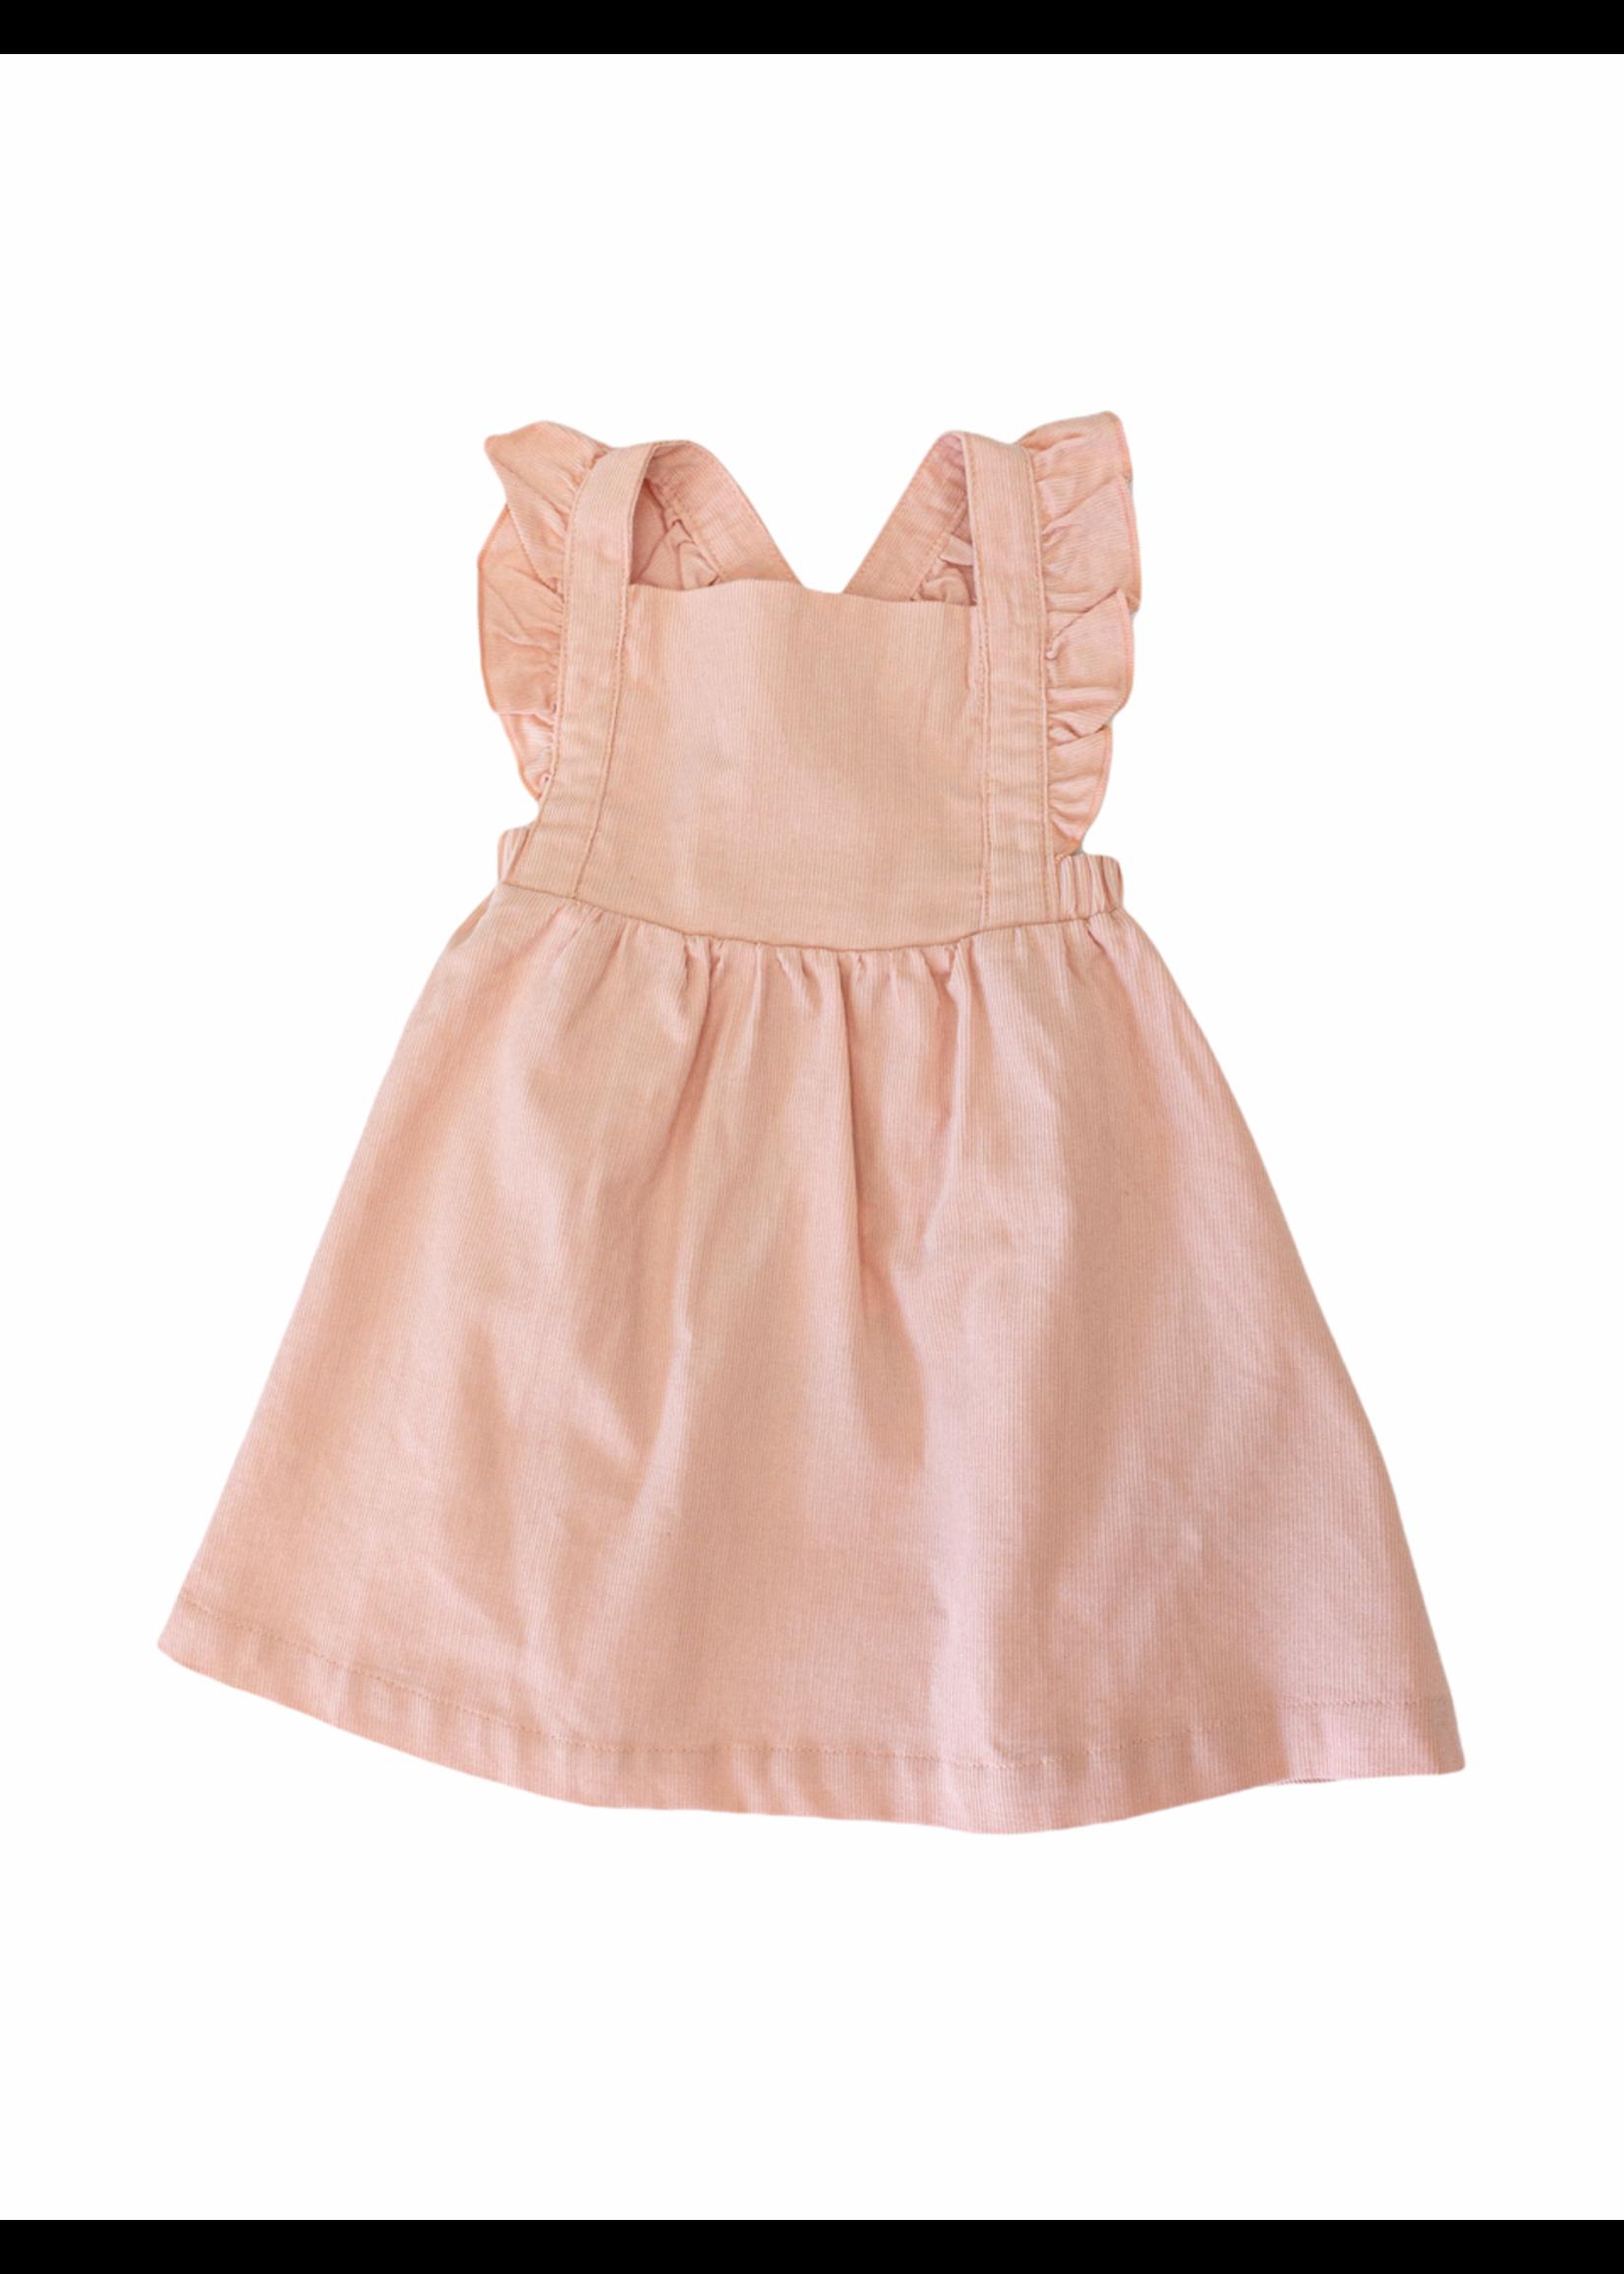 Angel Dear Pink Corduroy Pinafore Dress